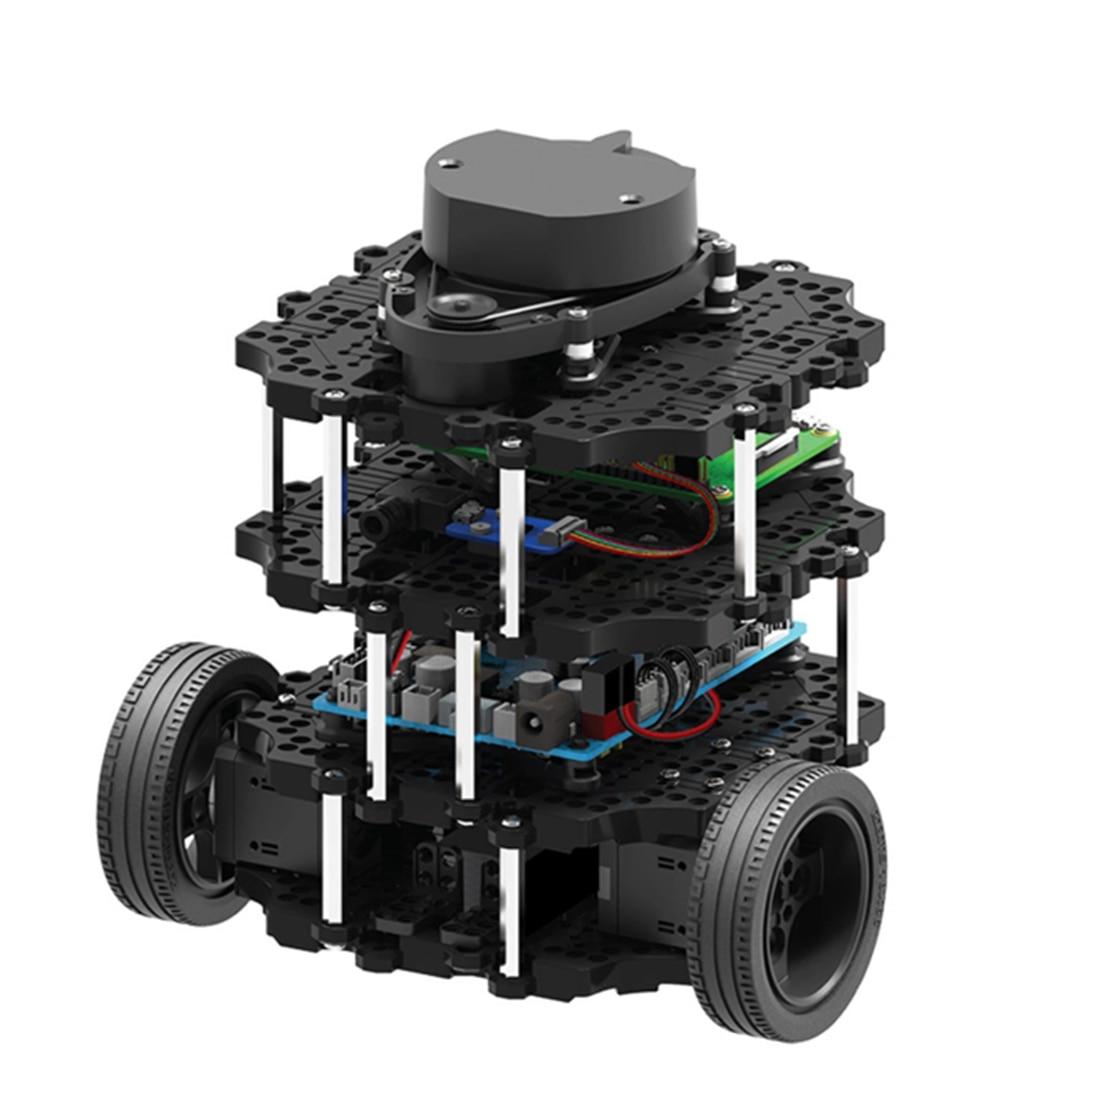 Intelligent Programmable ROS Robot Automatic Navigation SLAM Car Turtlebot3-Burger Pi3 Kit /Bulk Parts High Tech Toys